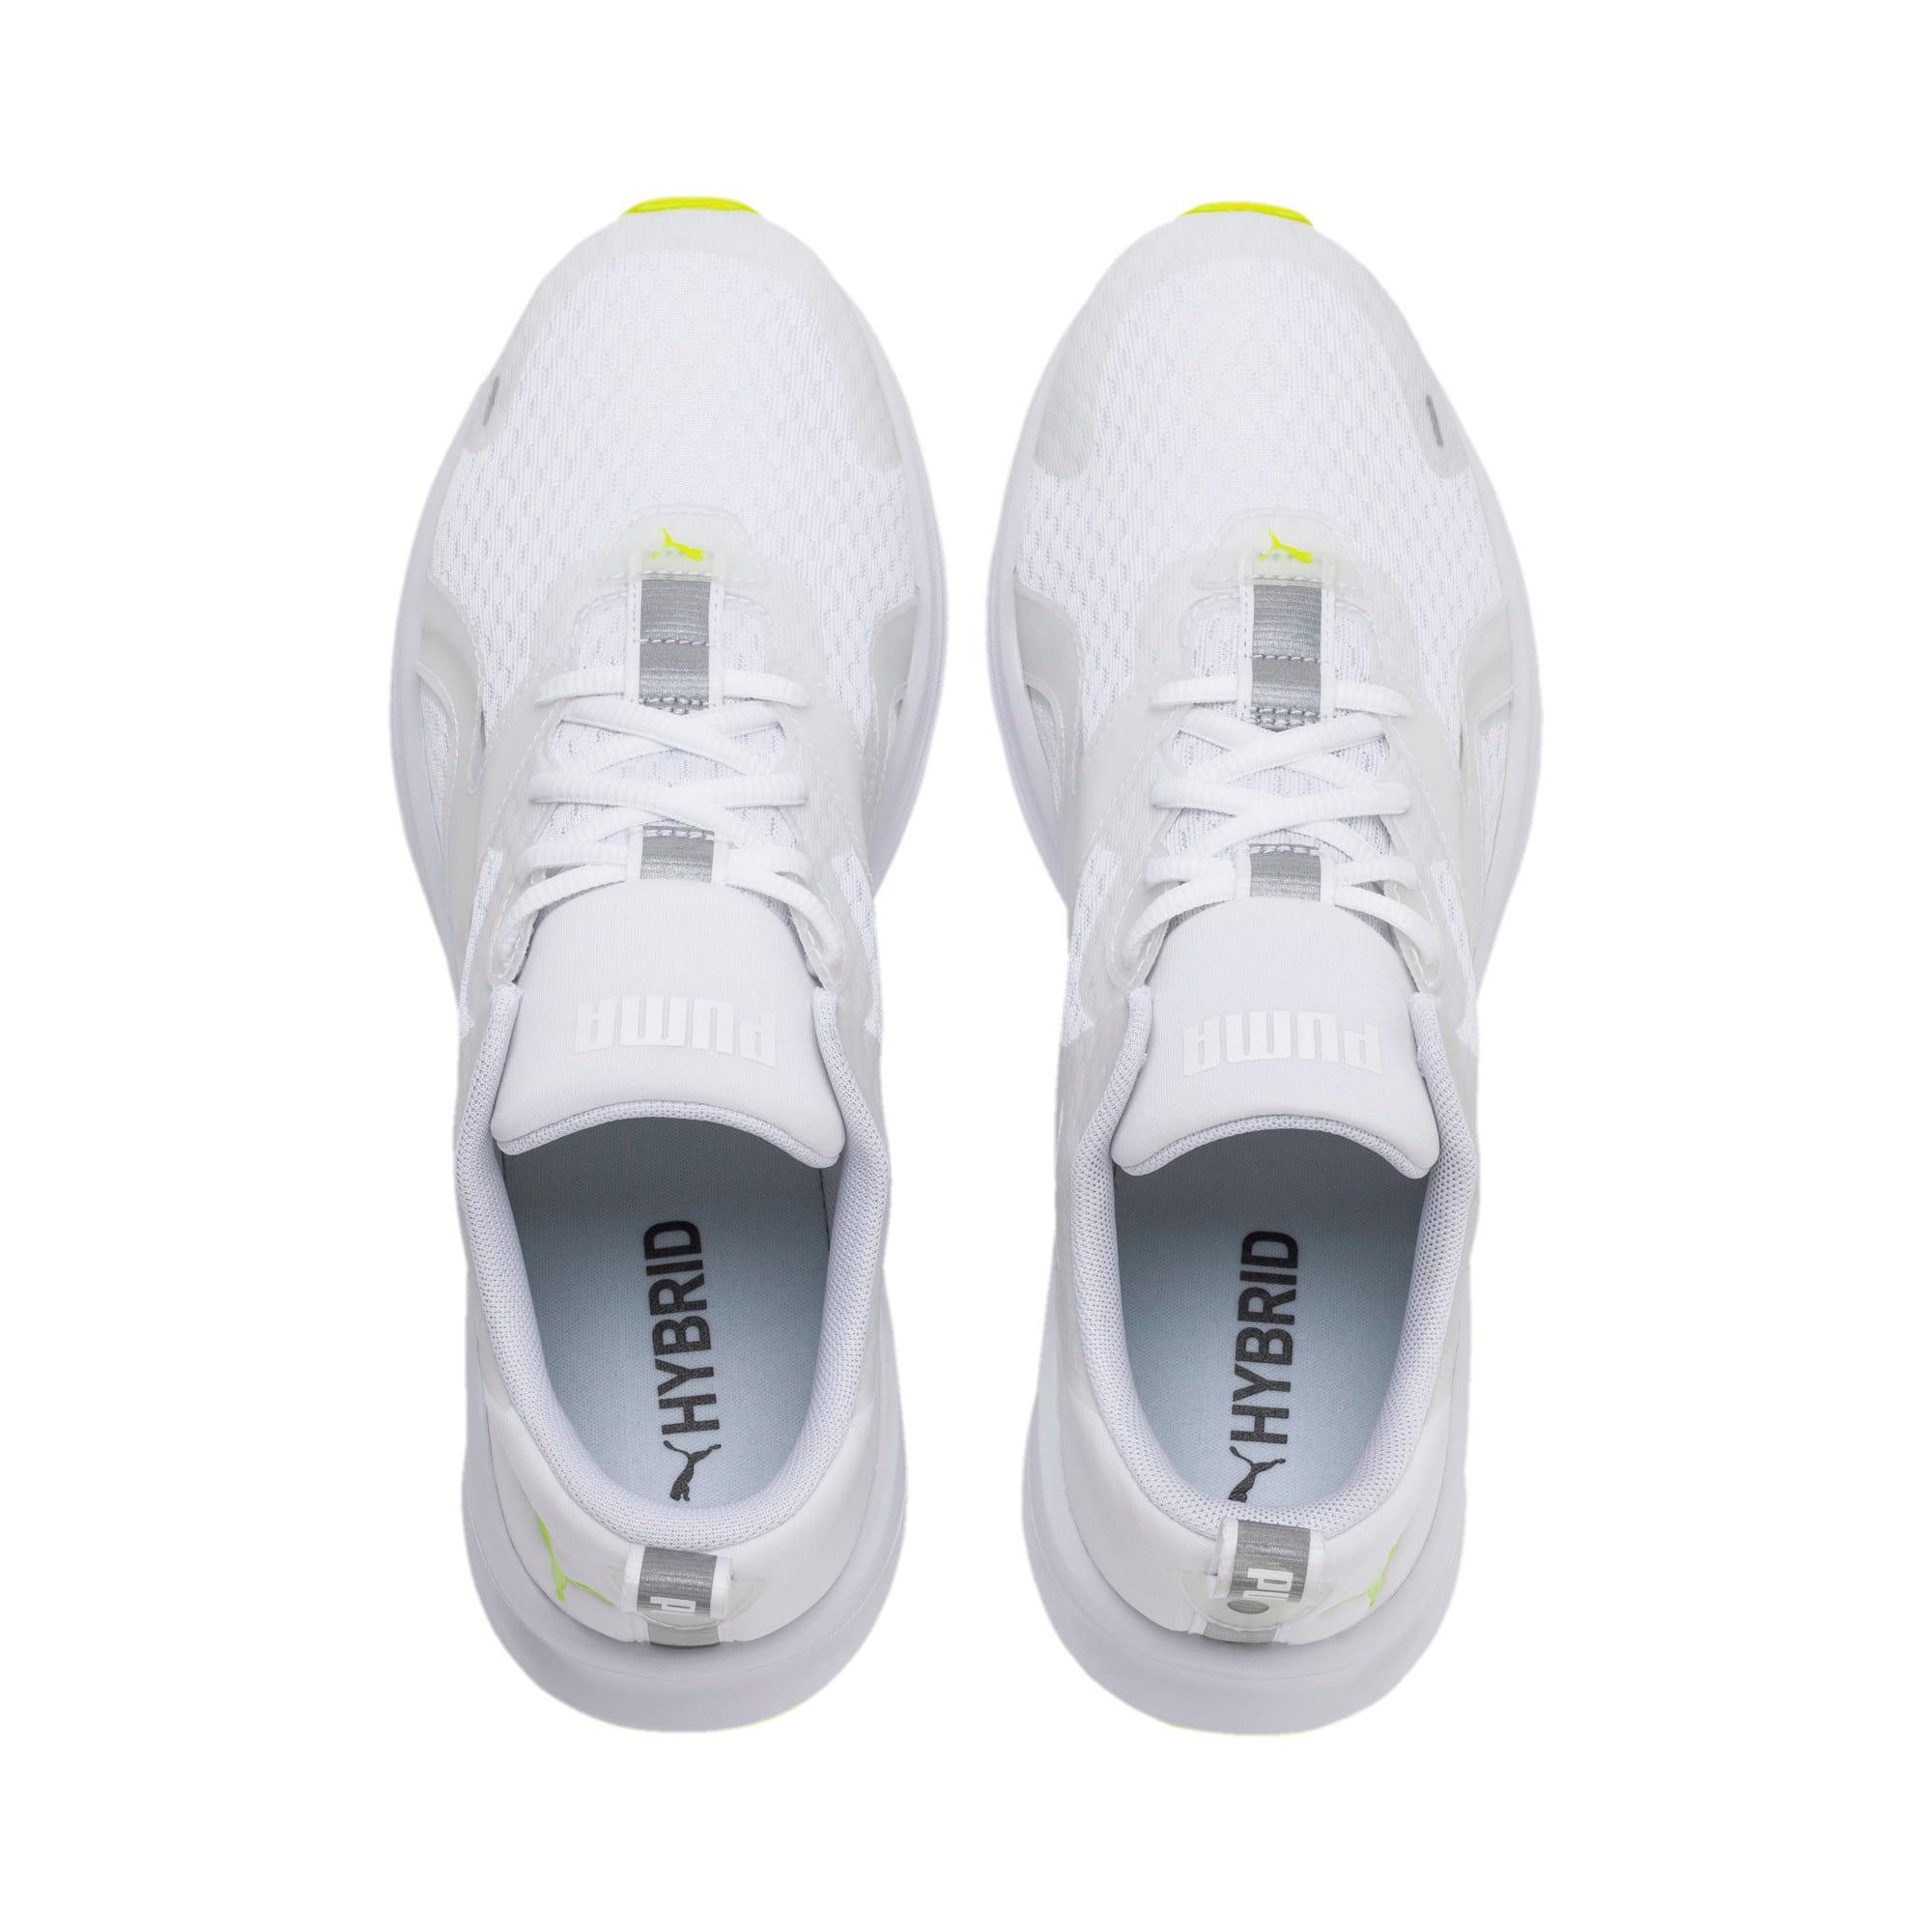 Thumbnail 7 of HYBRID Fuego Lights Men's Running Shoes, Puma White-Yellow Alert, medium